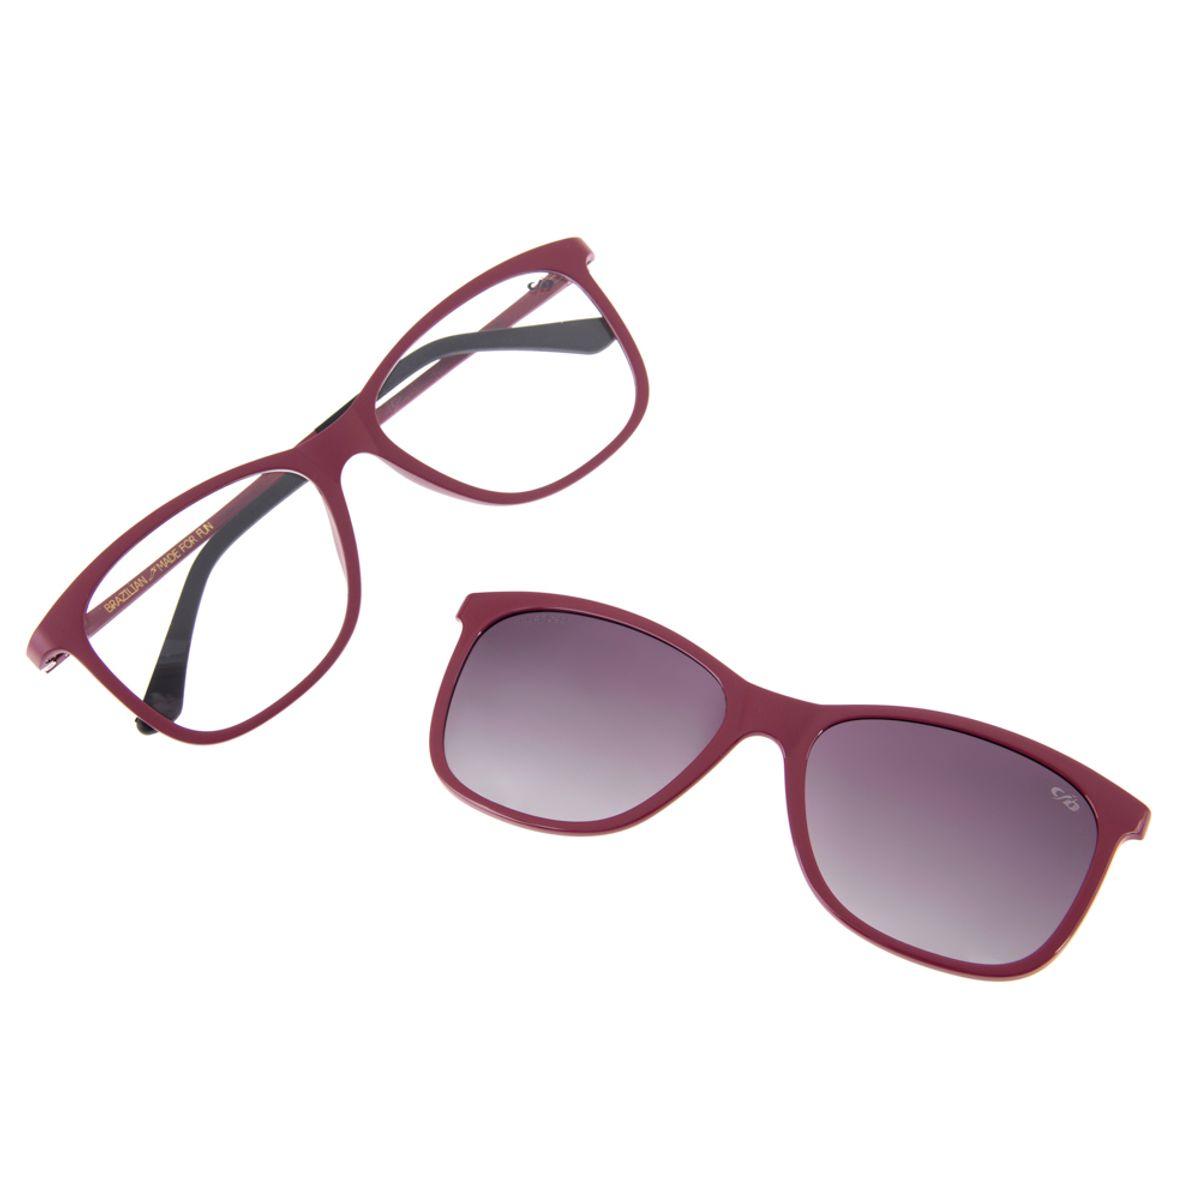 8c20aa3f8 Armação para Óculos de Grau Chilli Beans Multi Clip On Feminino ...